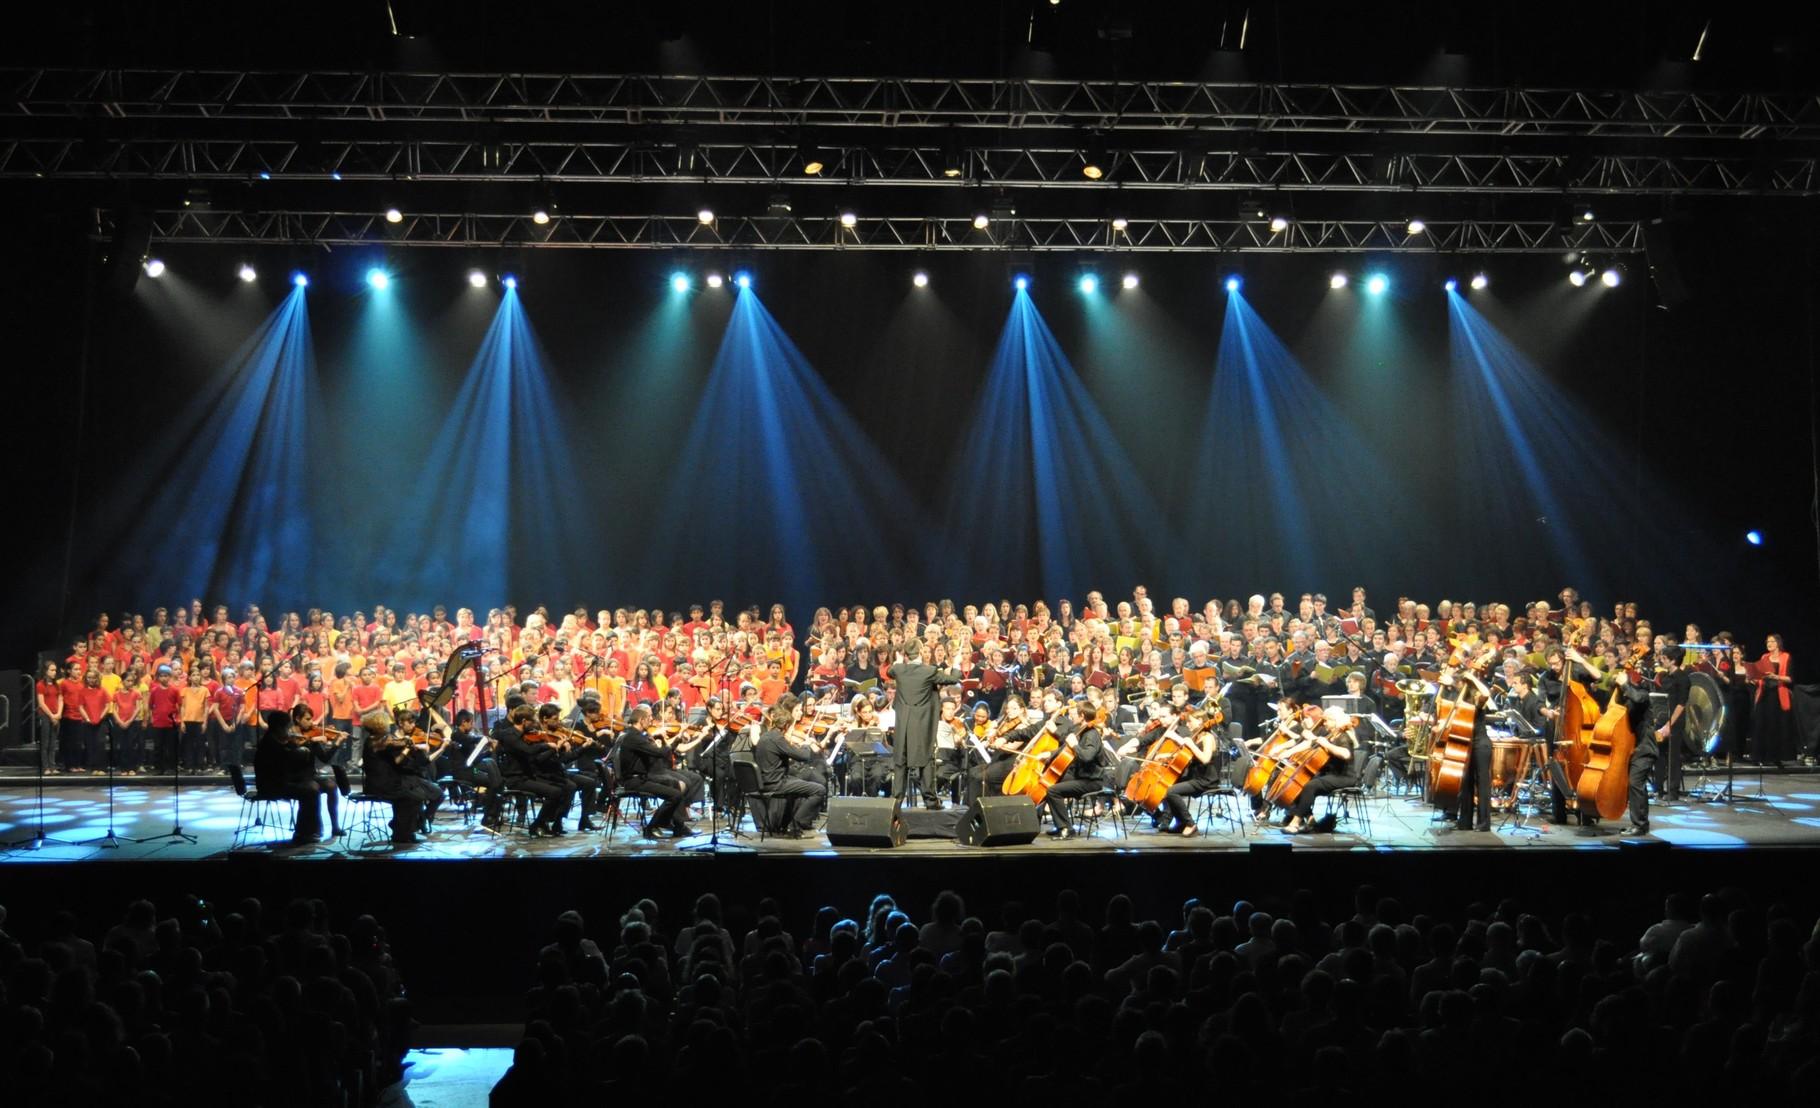 2011 - Dogora au Zenith d'Auvergne